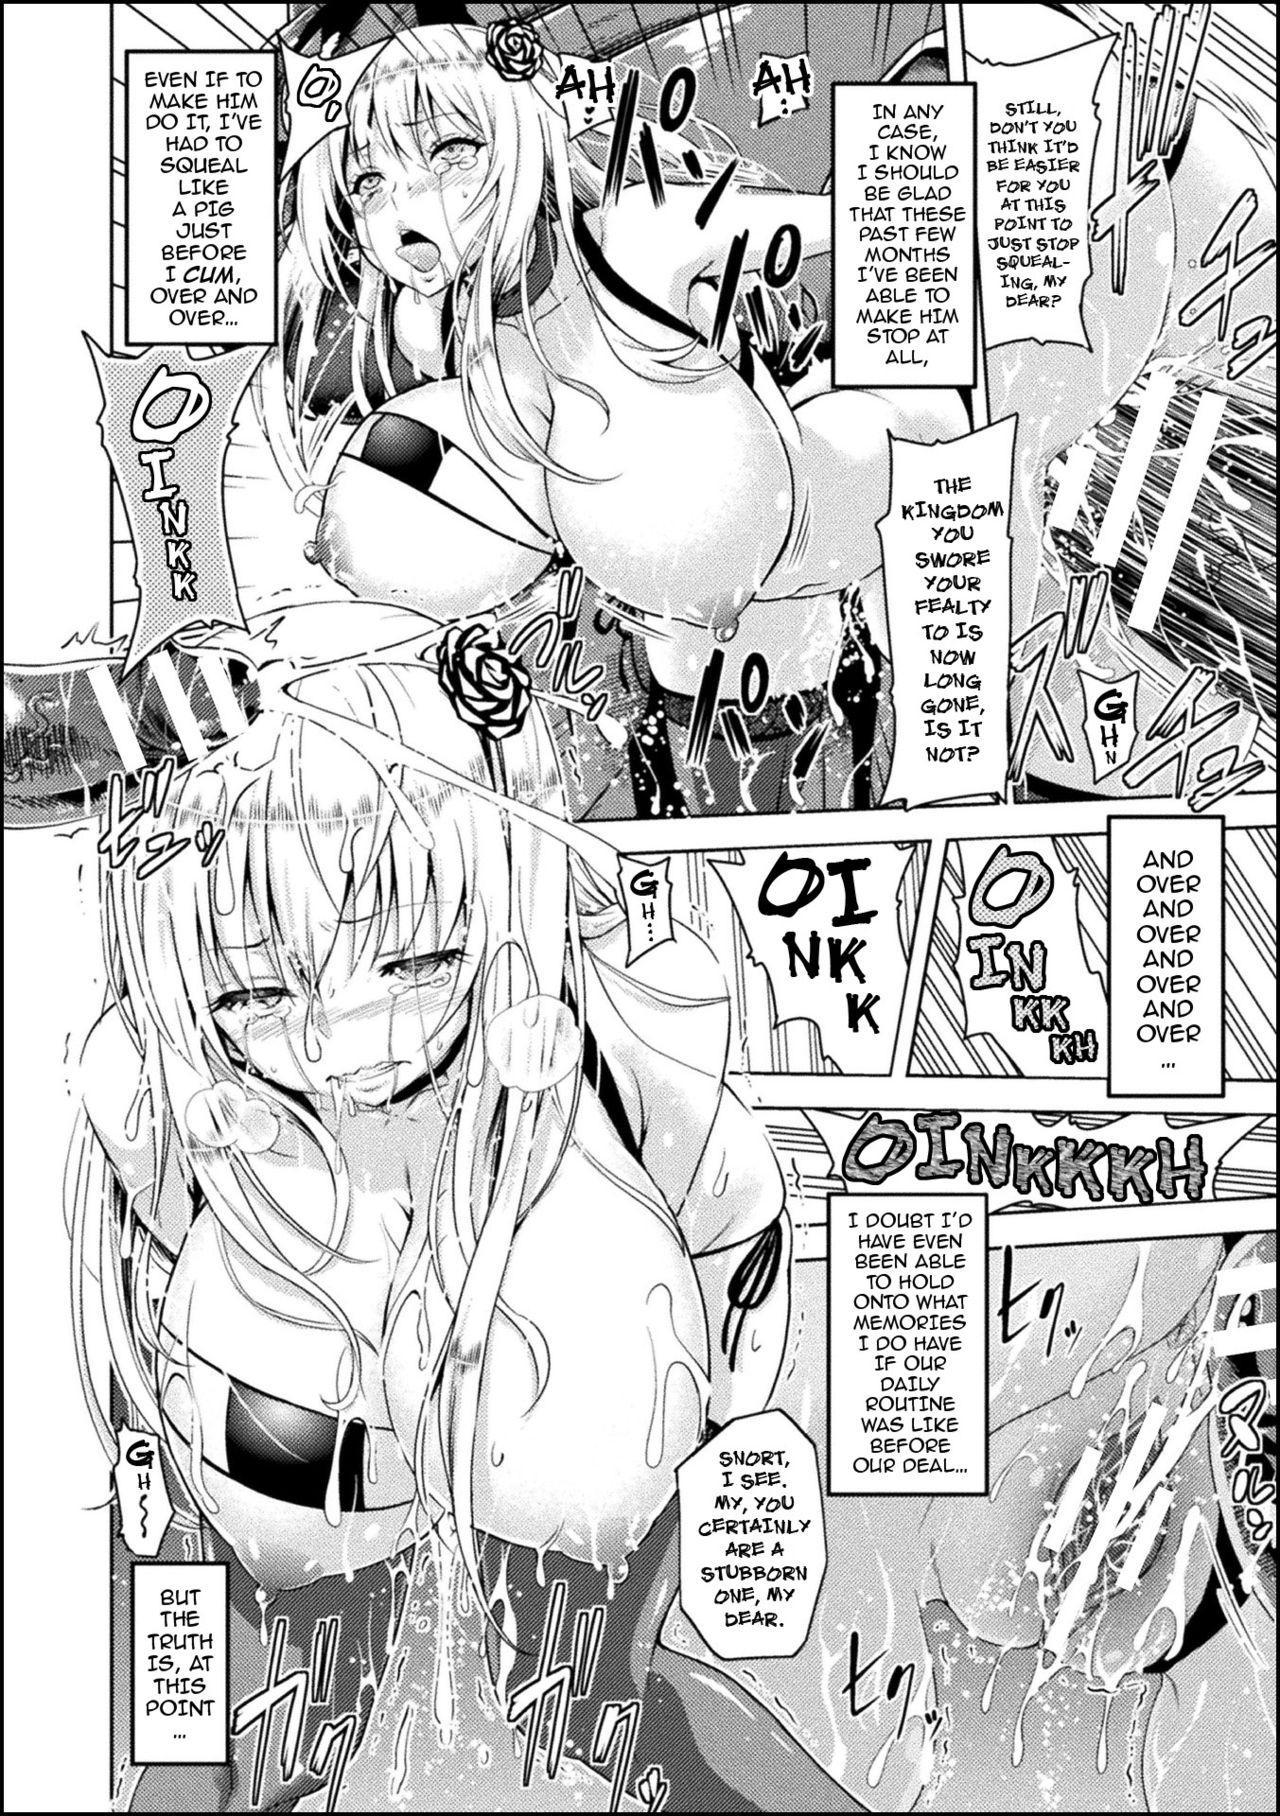 [Yamada Gogogo] Erona ~Orc no Inmon ni Okasareta Onna Kishi no Matsuro~ | Erona ~The Fall of a Beautiful Knight Cursed with the Lewd Mark of an Orc~ Ch. 1-5 [English] {darknight} 54